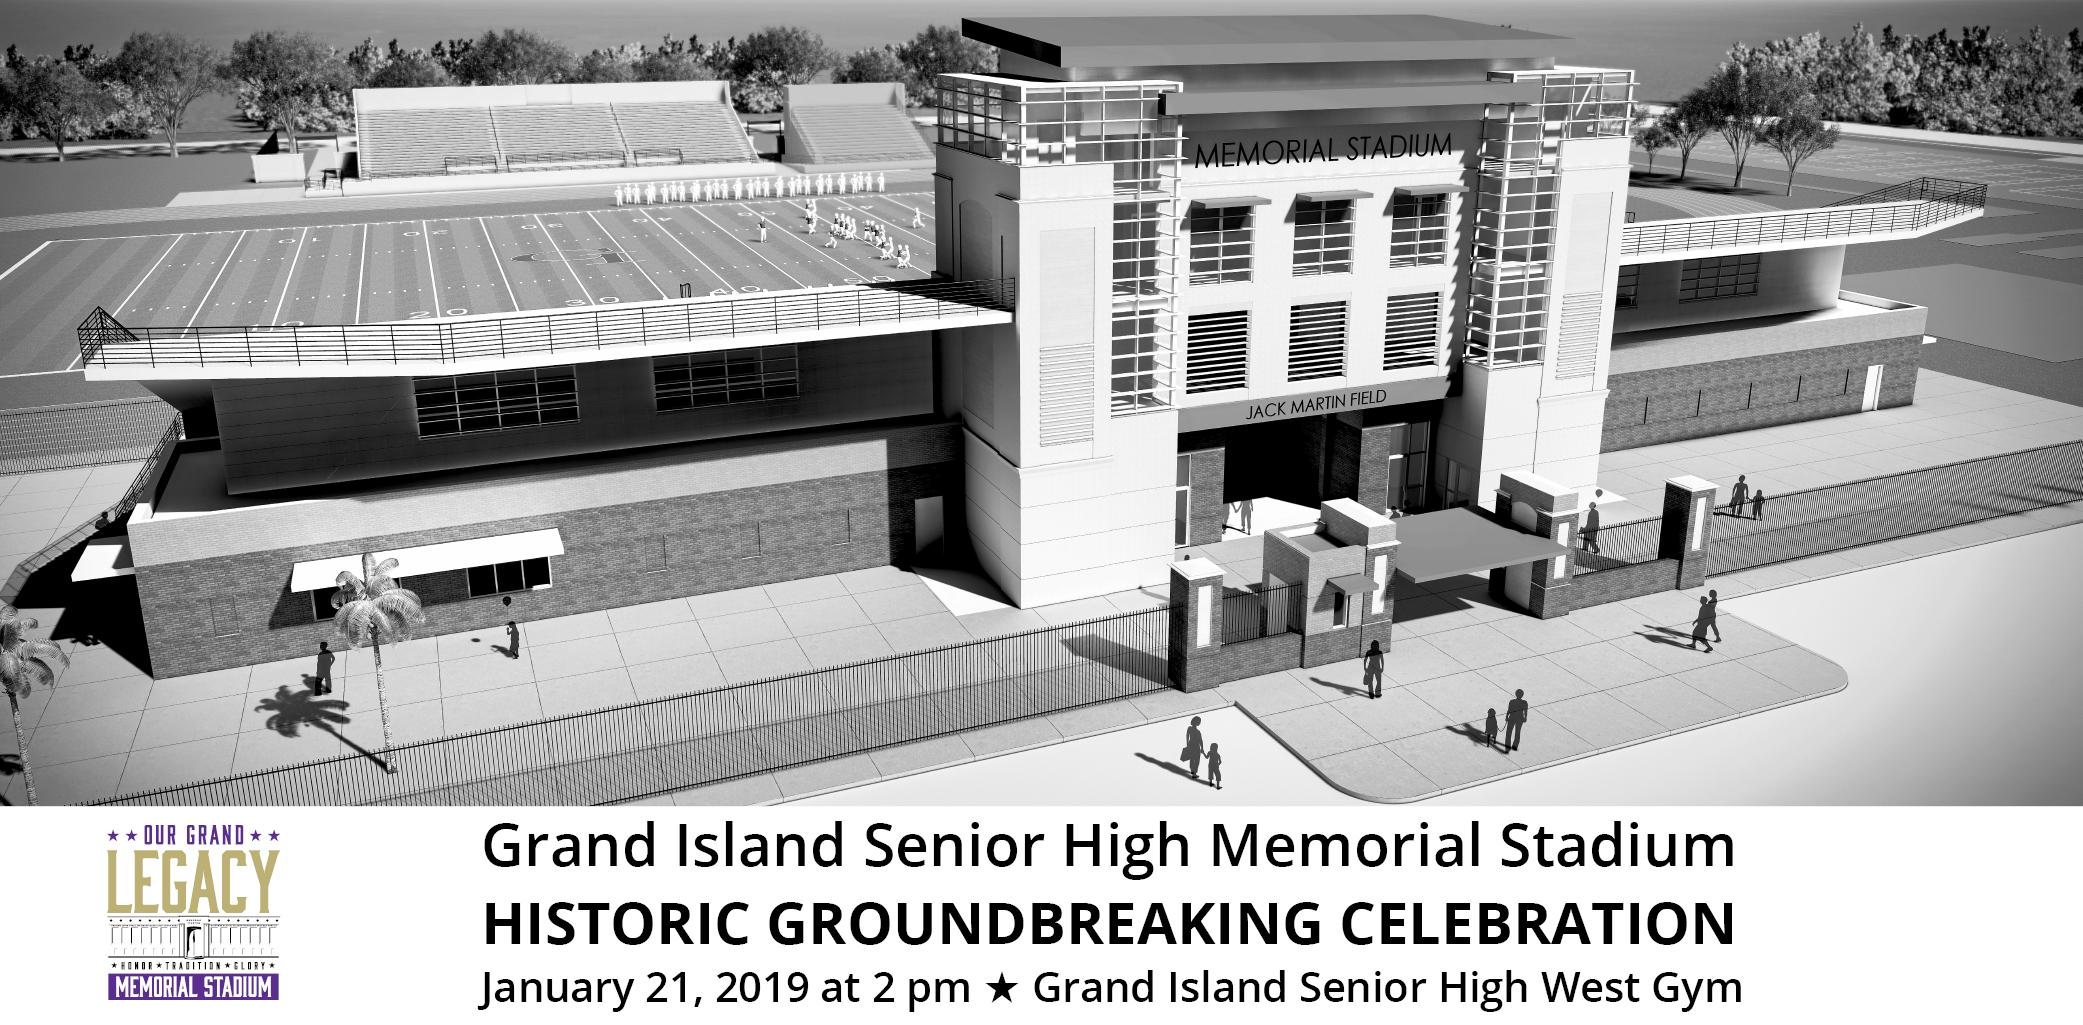 Historic Groundbreaking Celebration